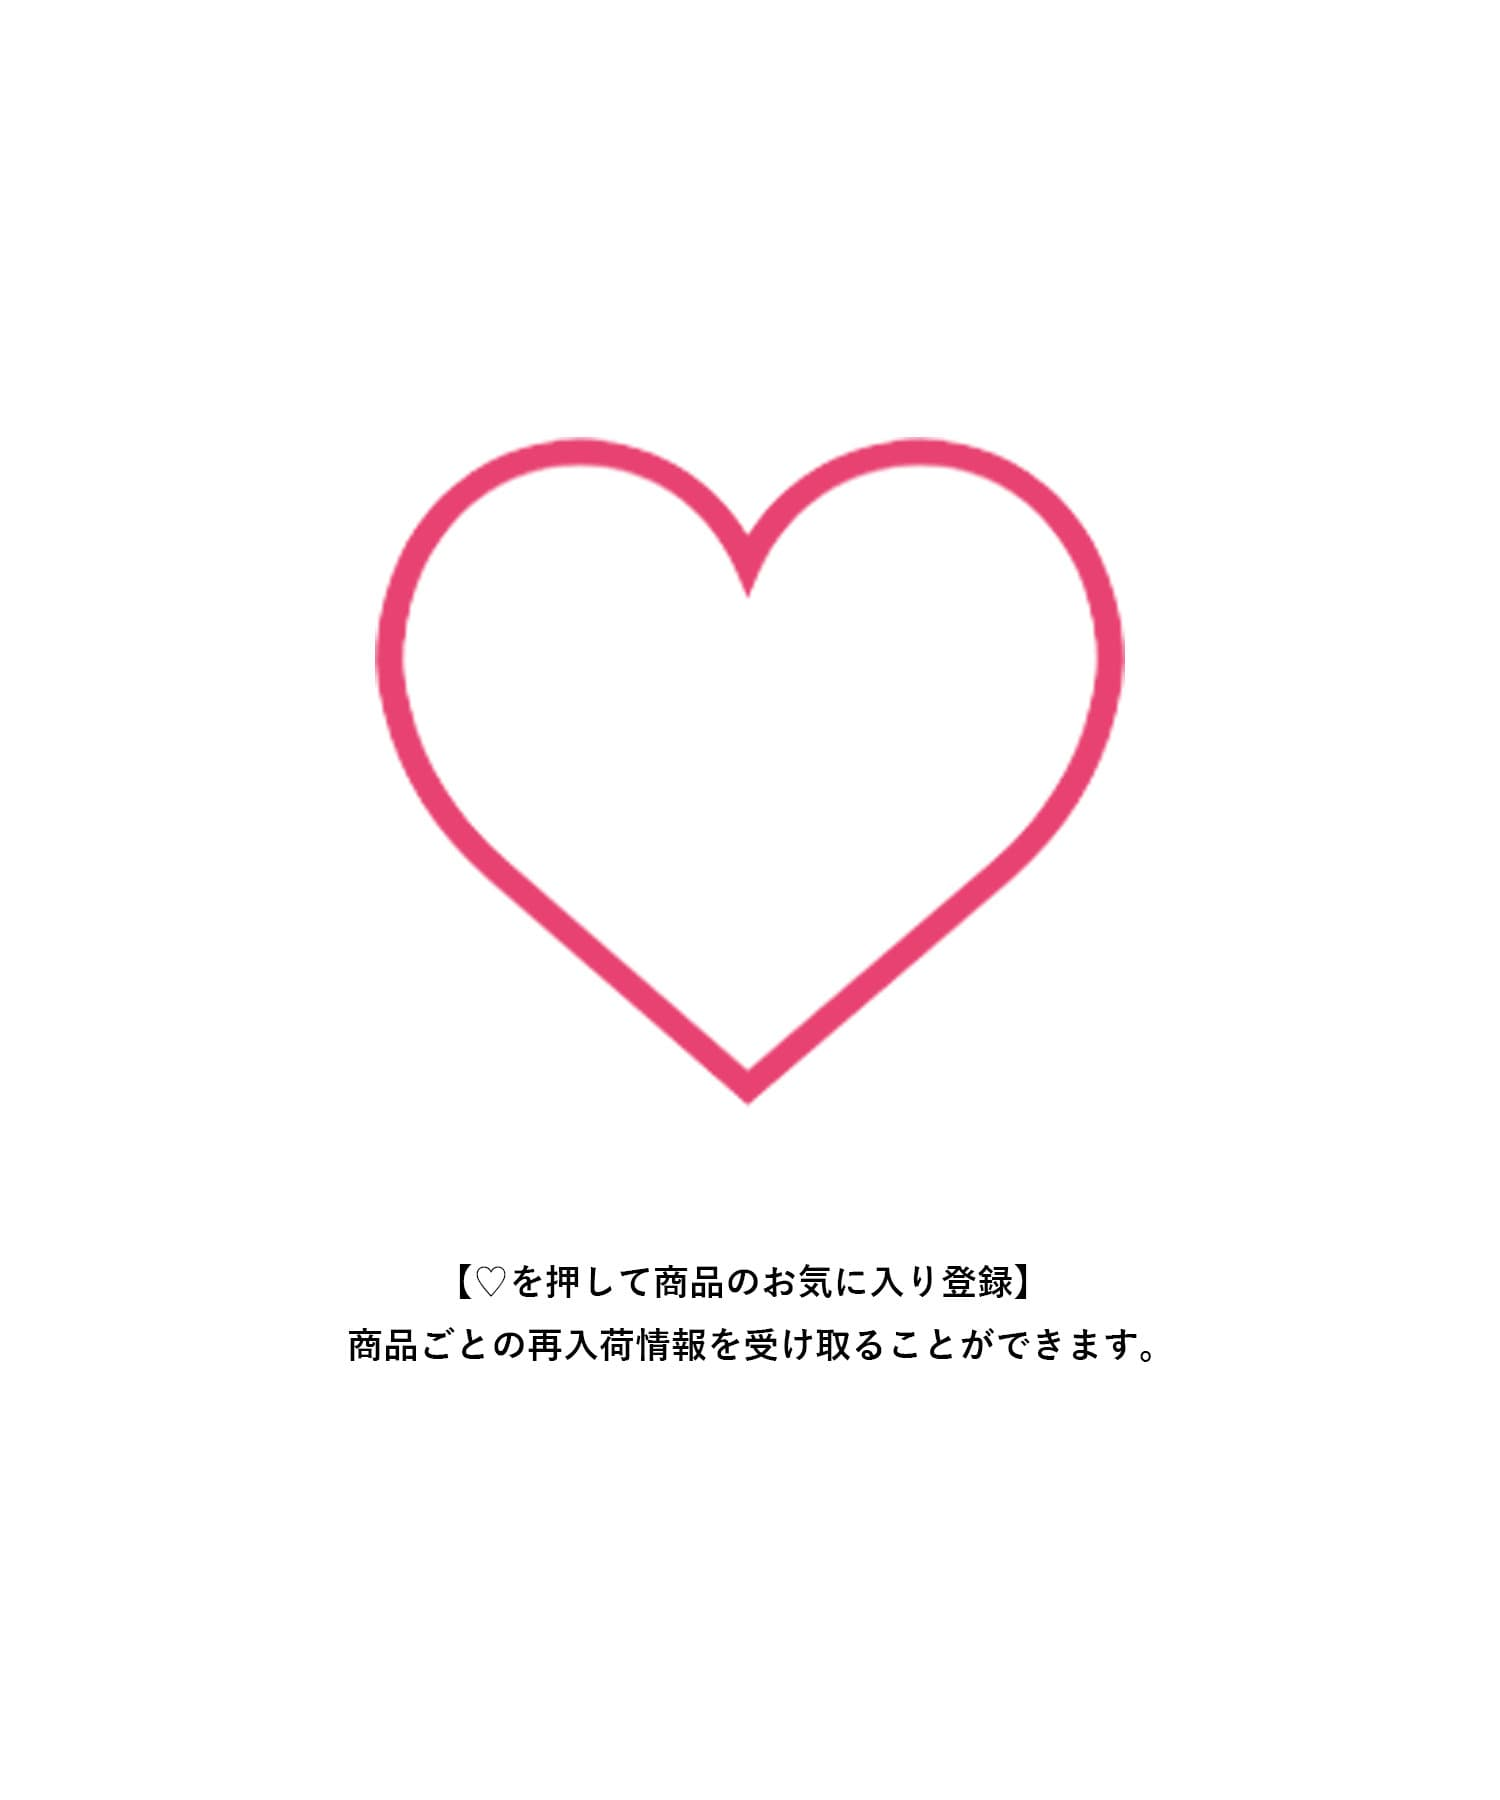 COLLAGE GALLARDAGALANTE(コラージュ ガリャルダガランテ) 【PAPILLONNER/パピヨネ】アーチメタルピアス